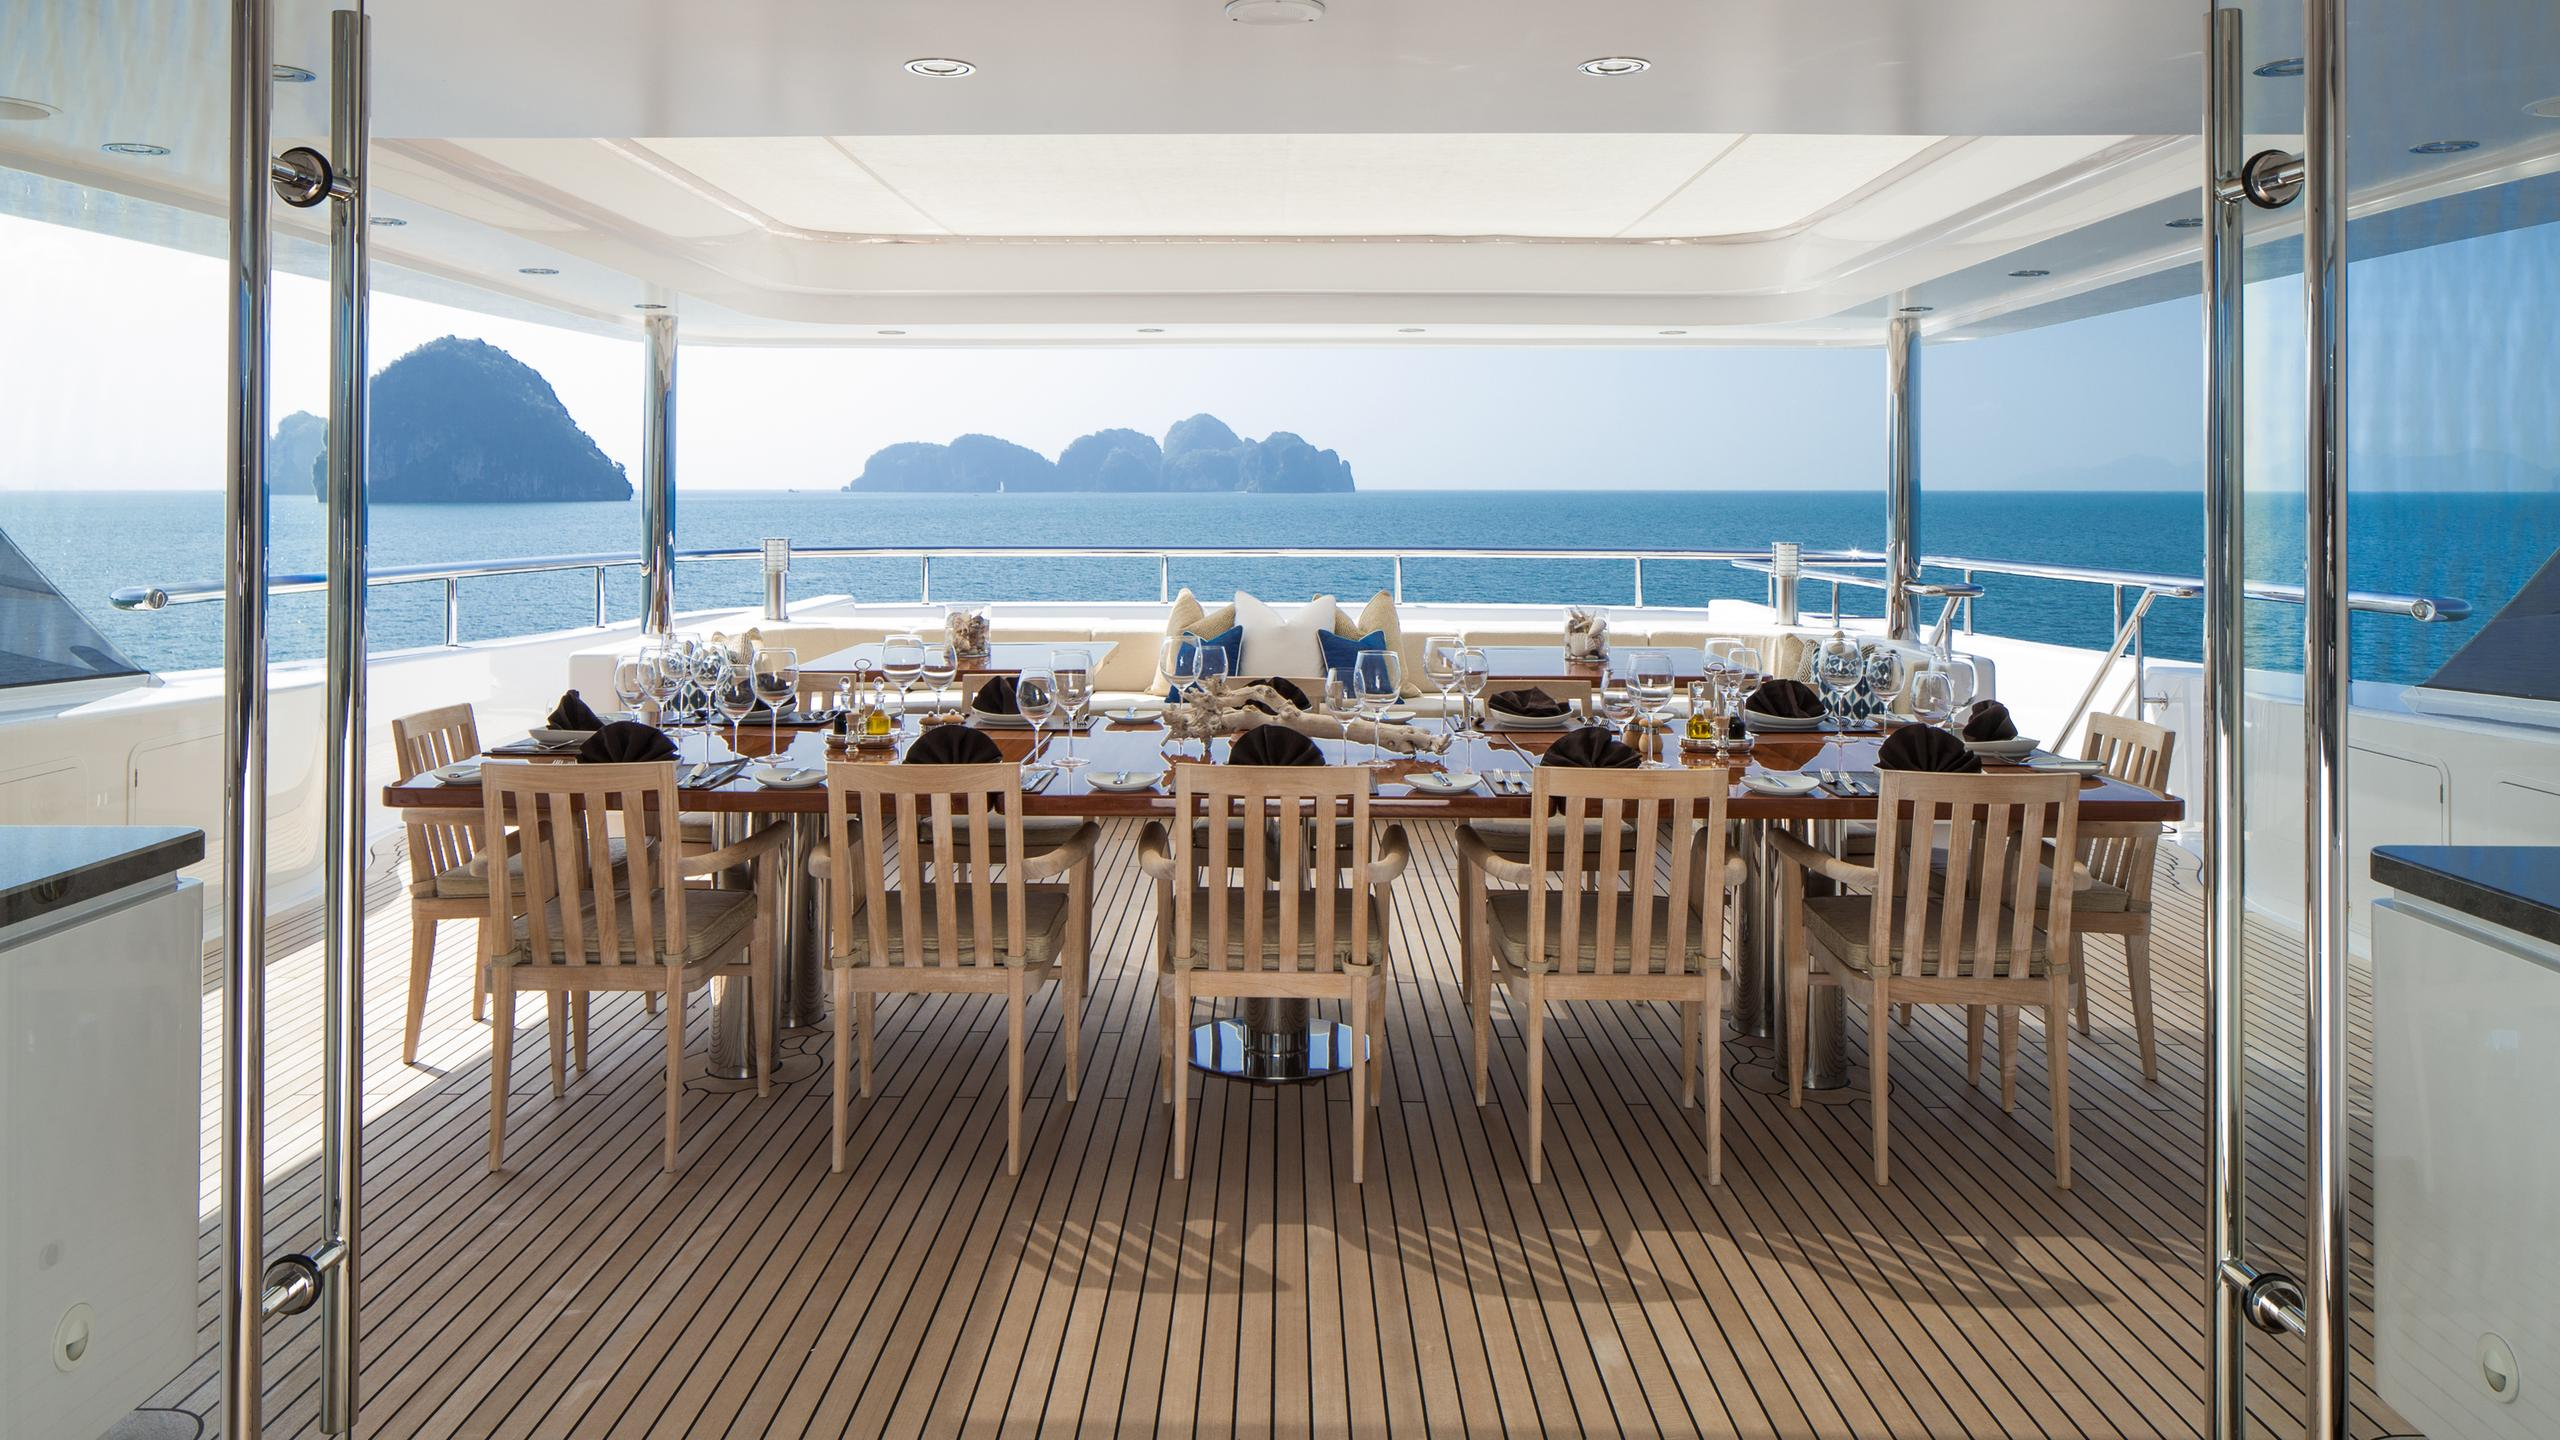 cloud-9-yacht-aft-dining